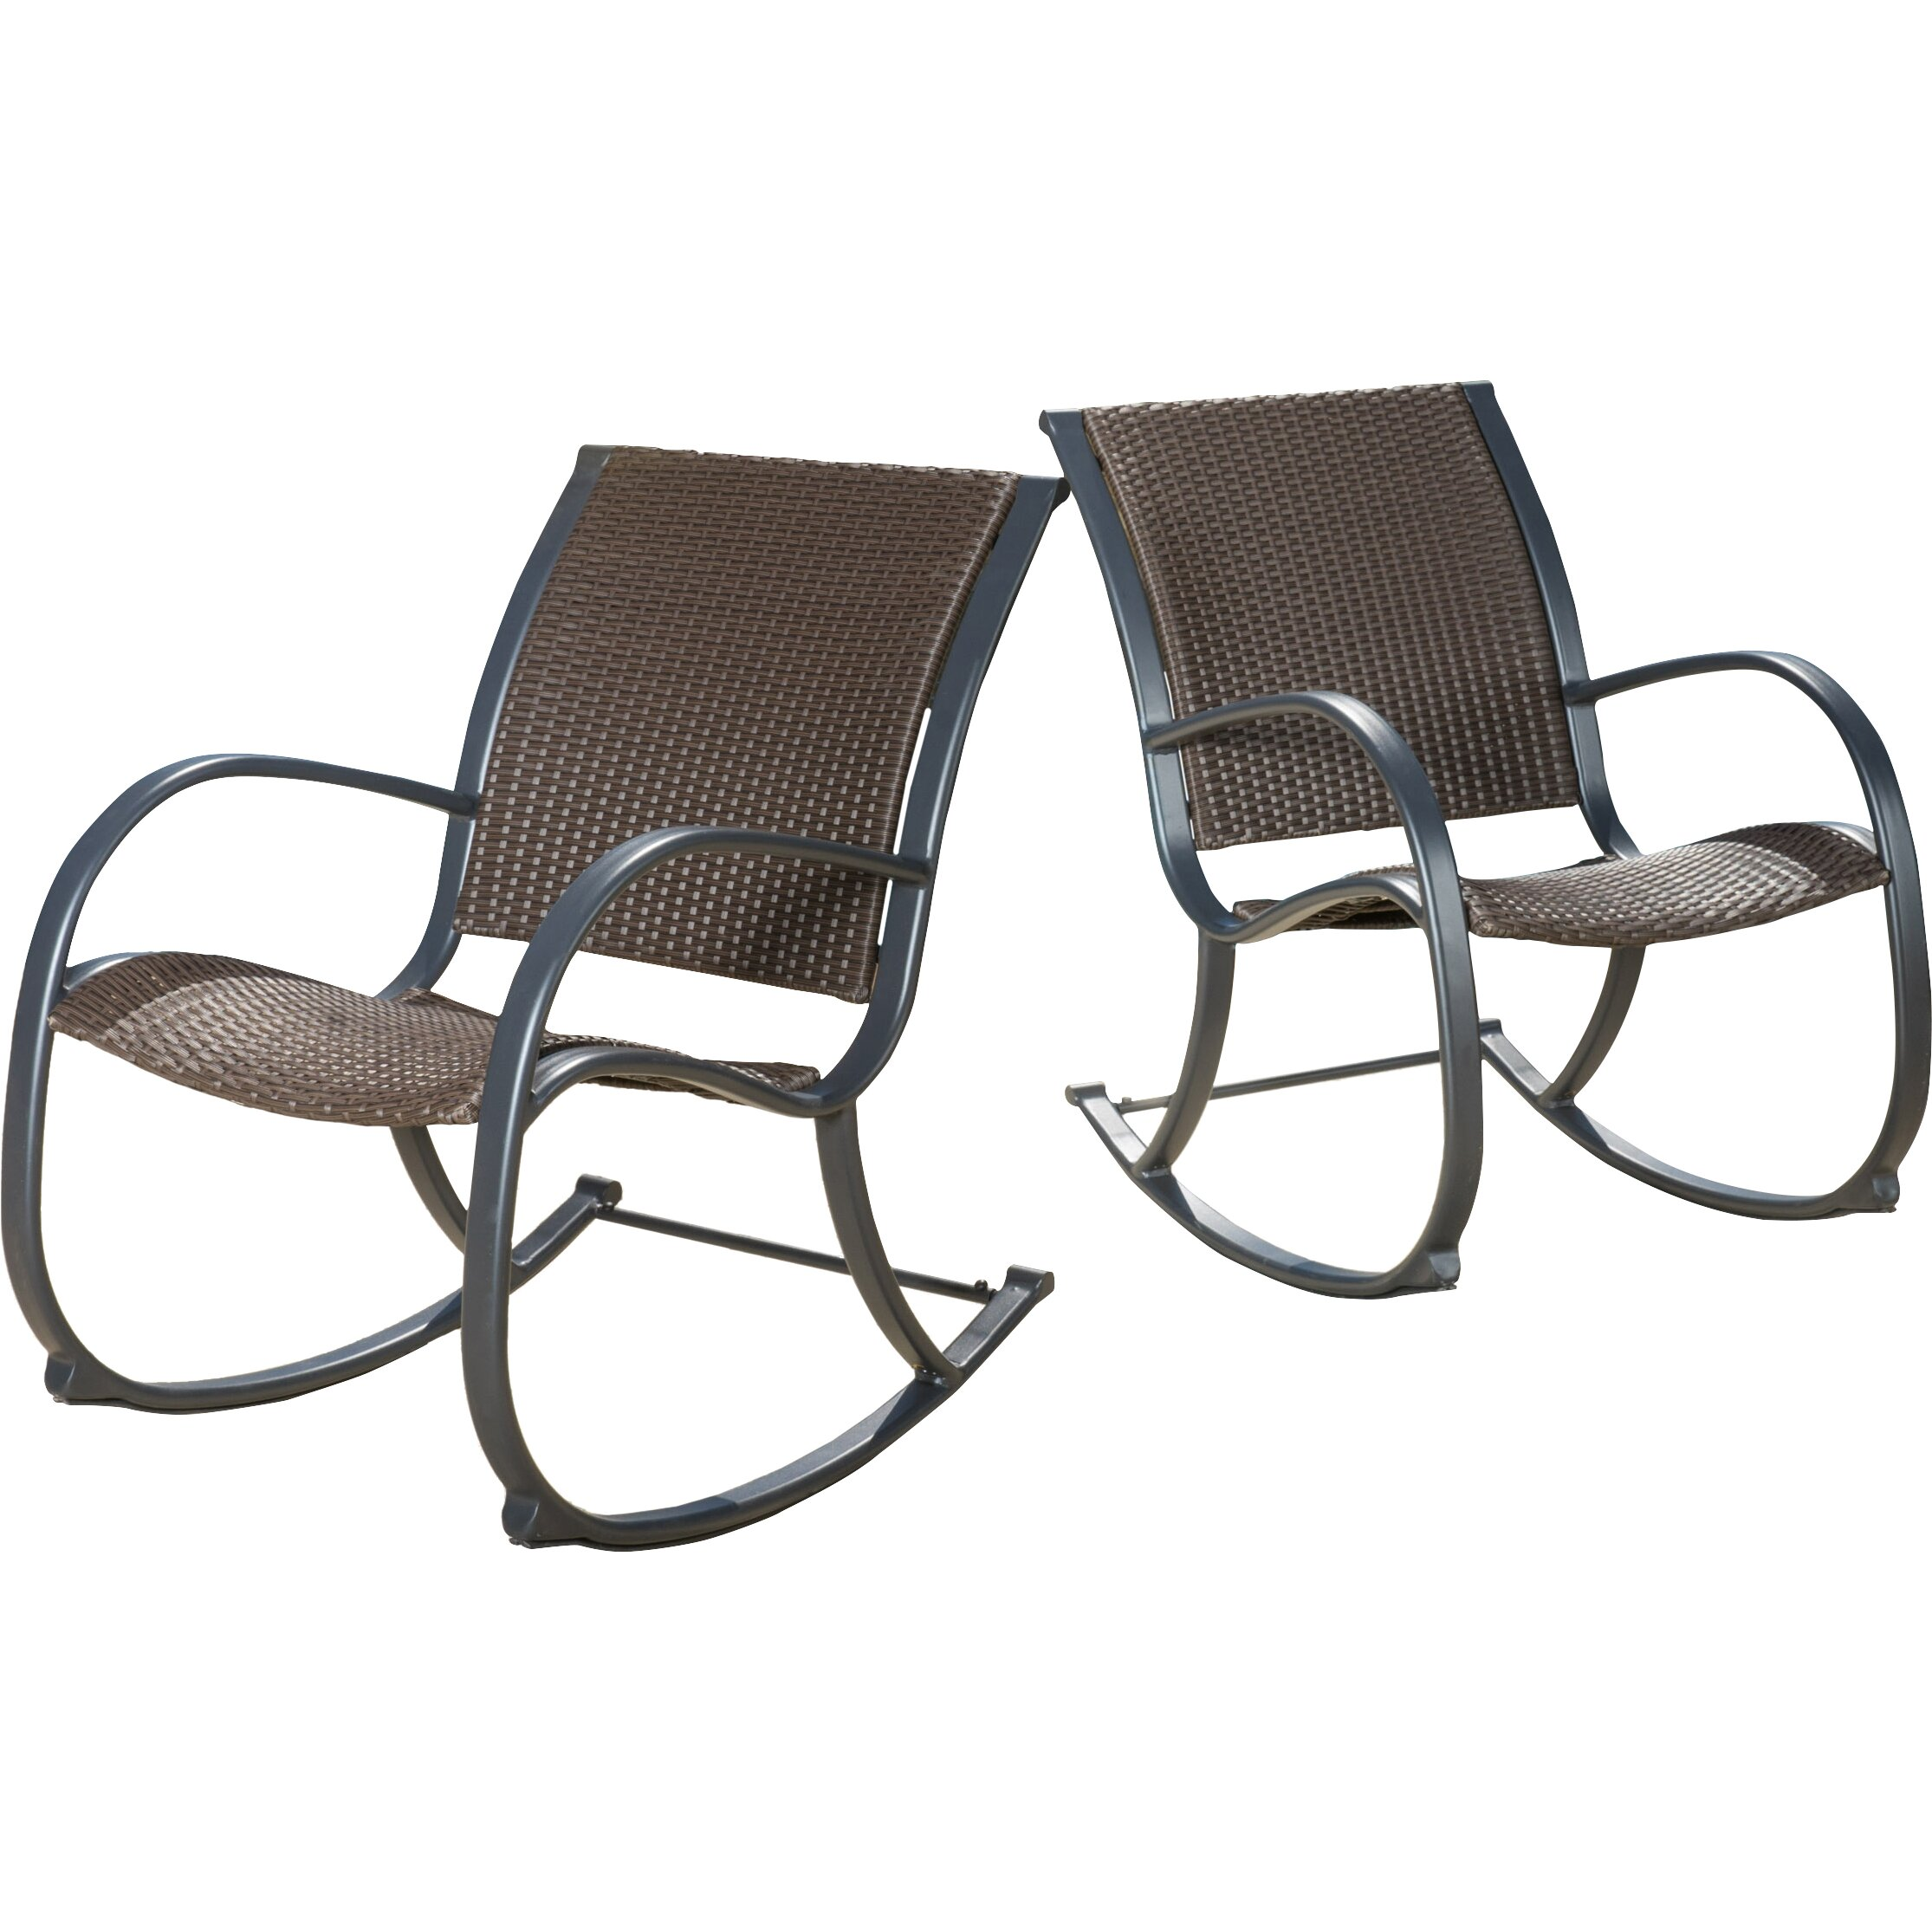 ... Wicker/Rattan Patio Rocking Chairs & Gliders Home Loft Concepts SKU